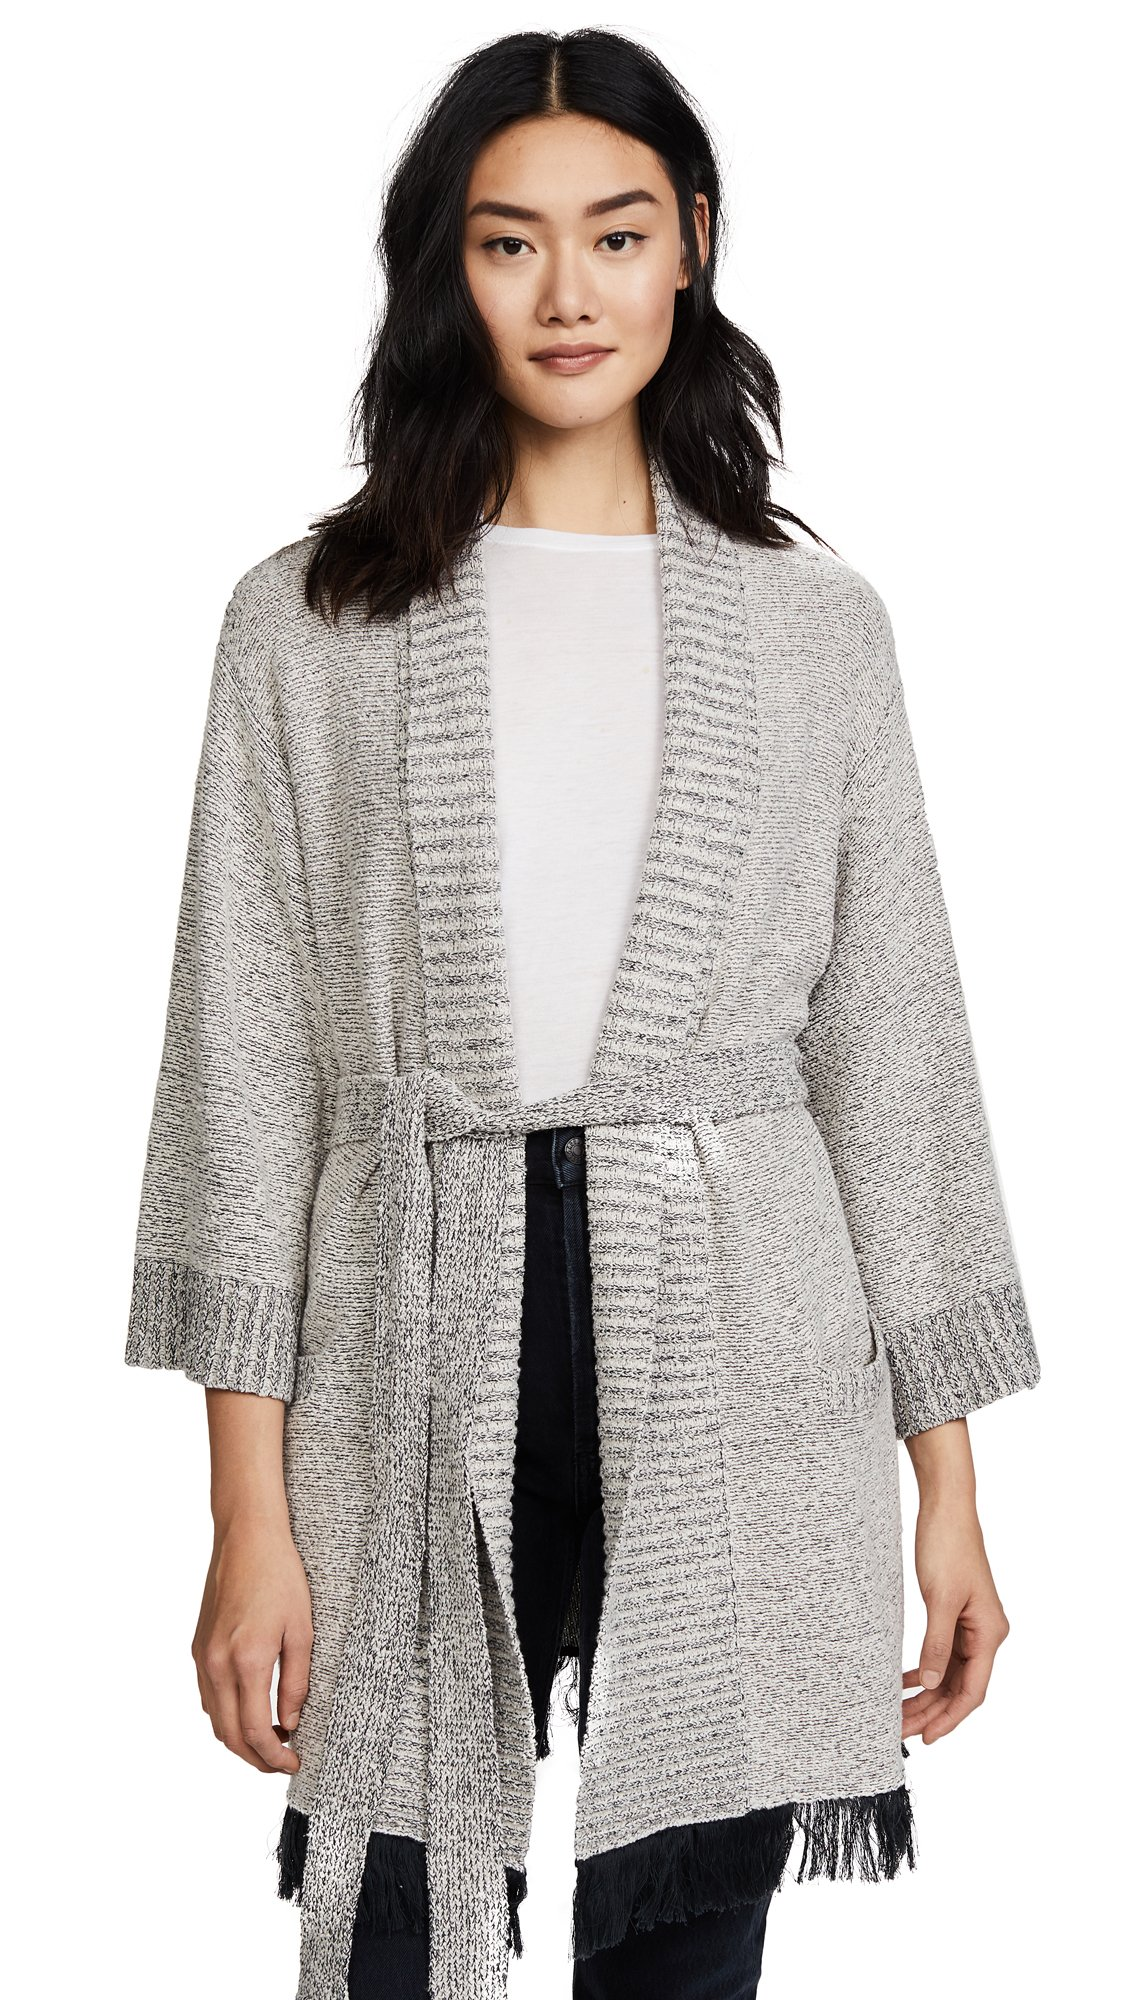 Skin Women's Cozy Boucle Robe, Ivory, 3